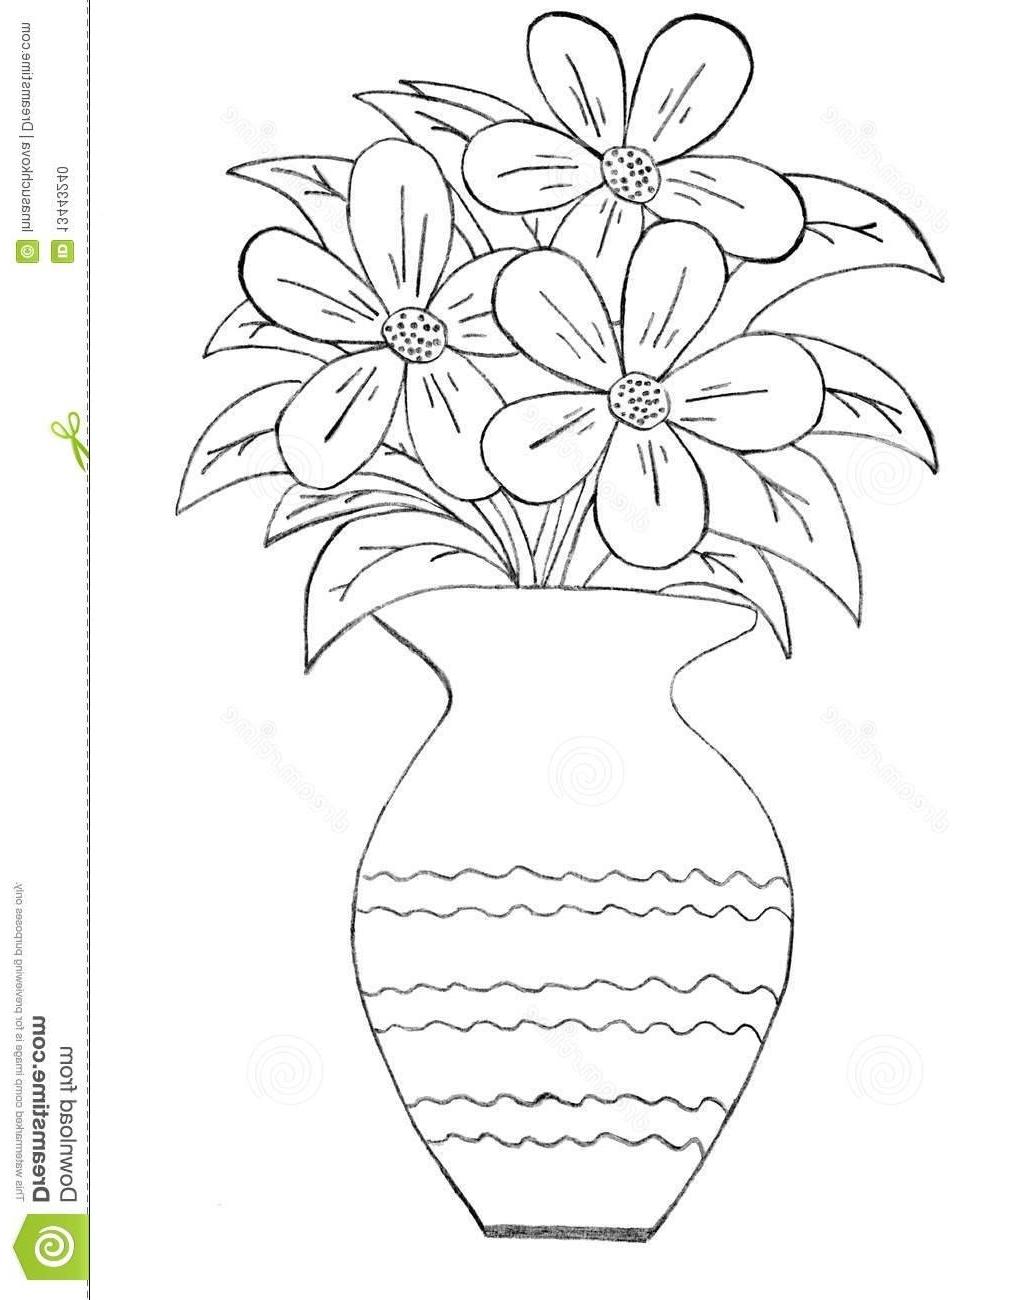 1035x1300 Vase Drawing Flower Drawn Sunflower Vase Drawing